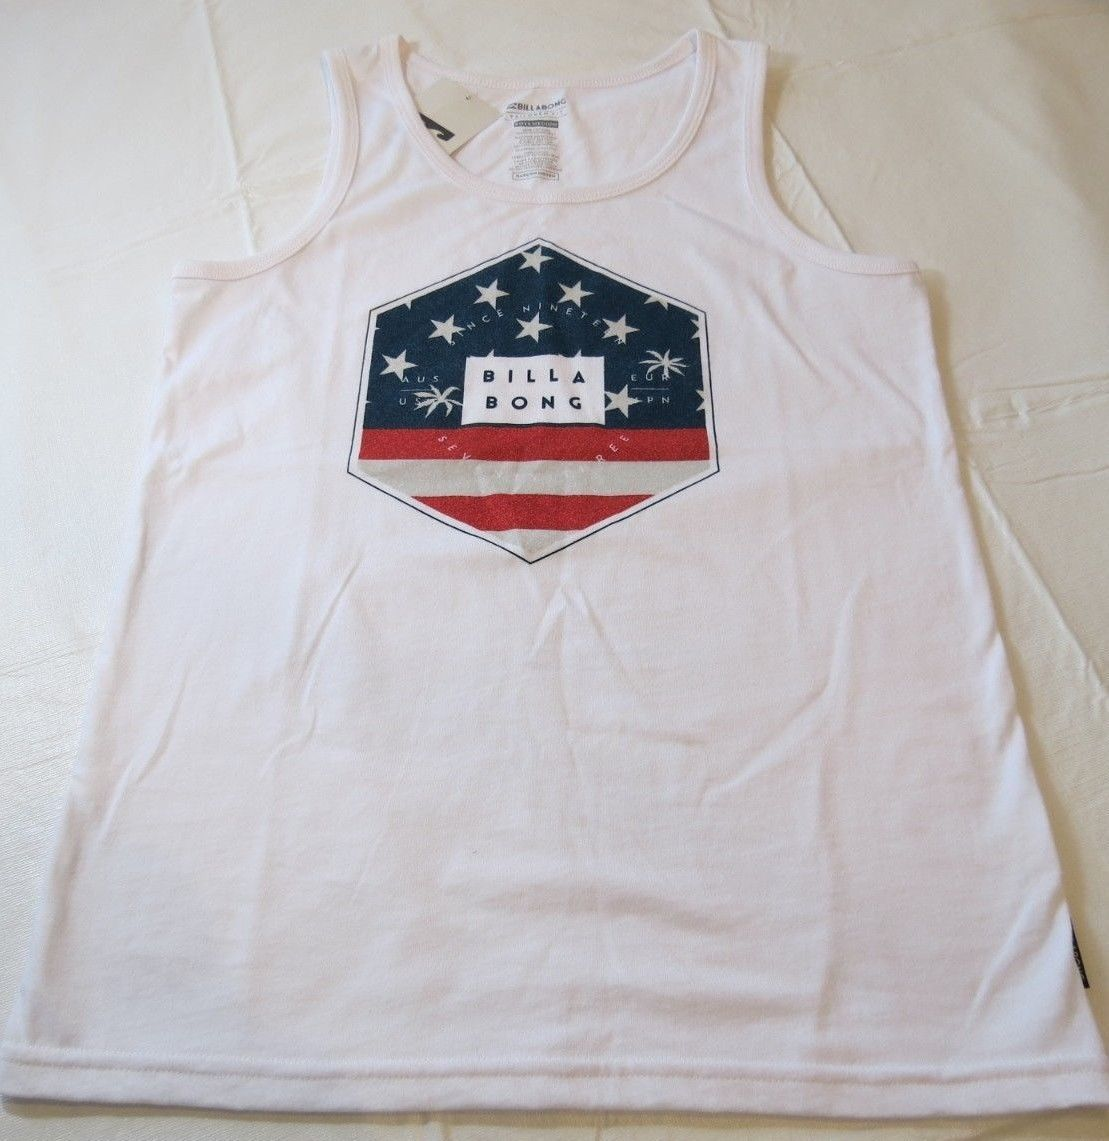 Billabong Boys youth tank top shirt XL Tailored Fit Access BT83PBAC White Flag